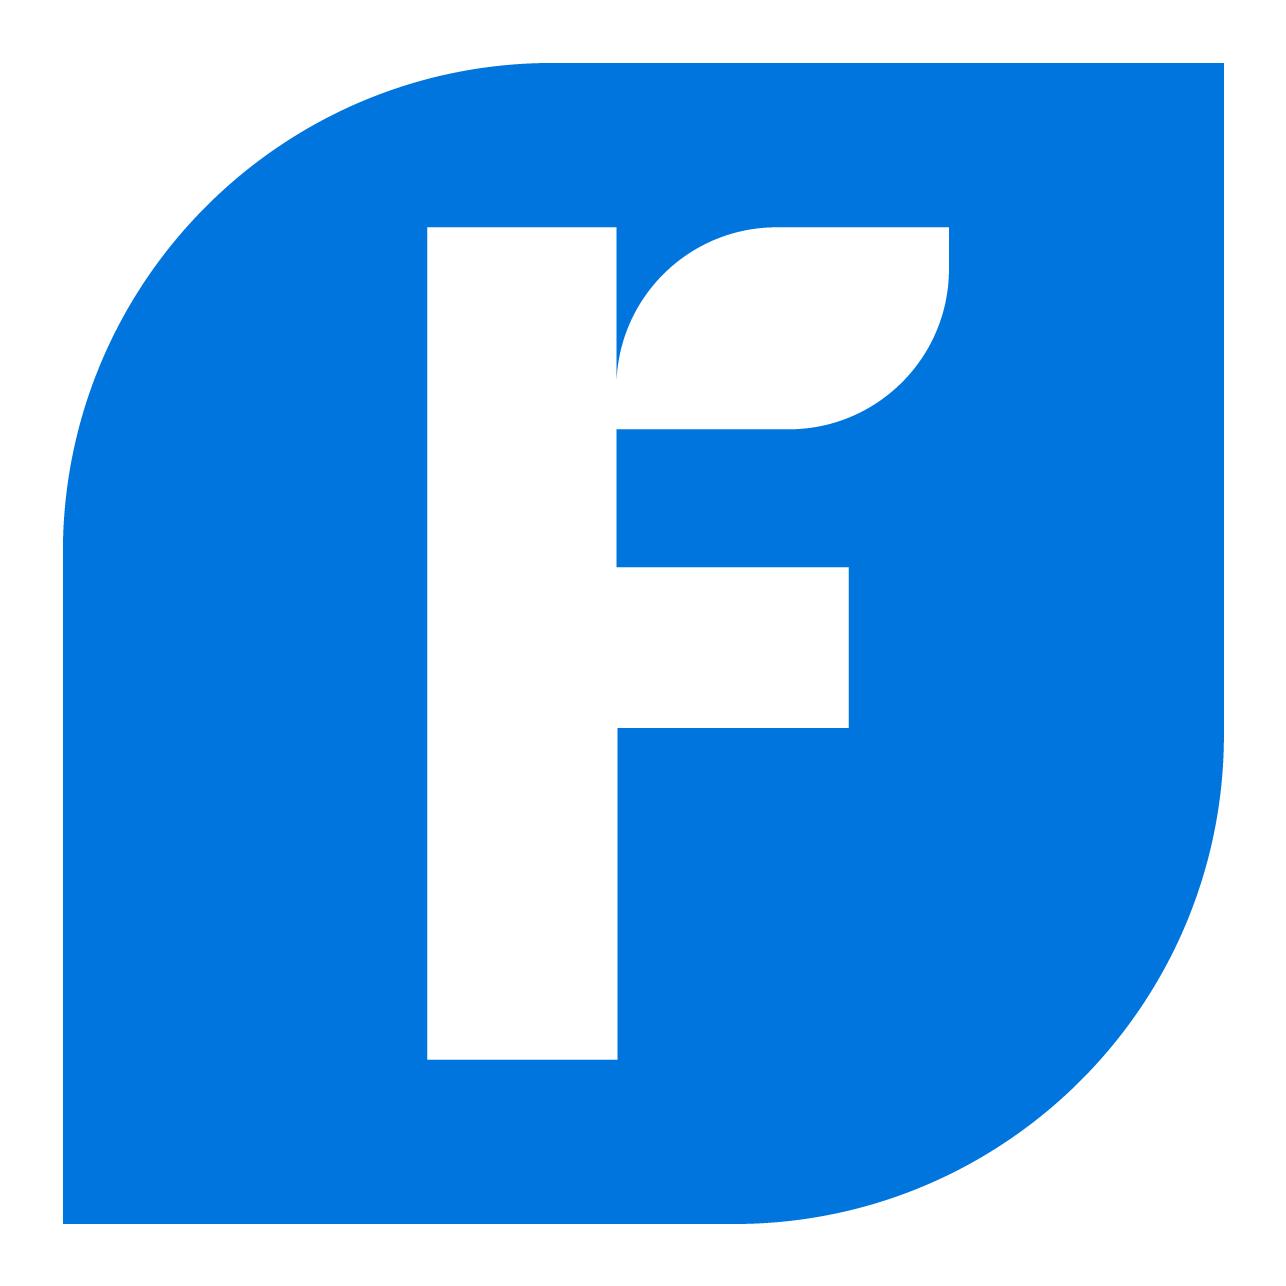 fb_logoguidelines_030620_5